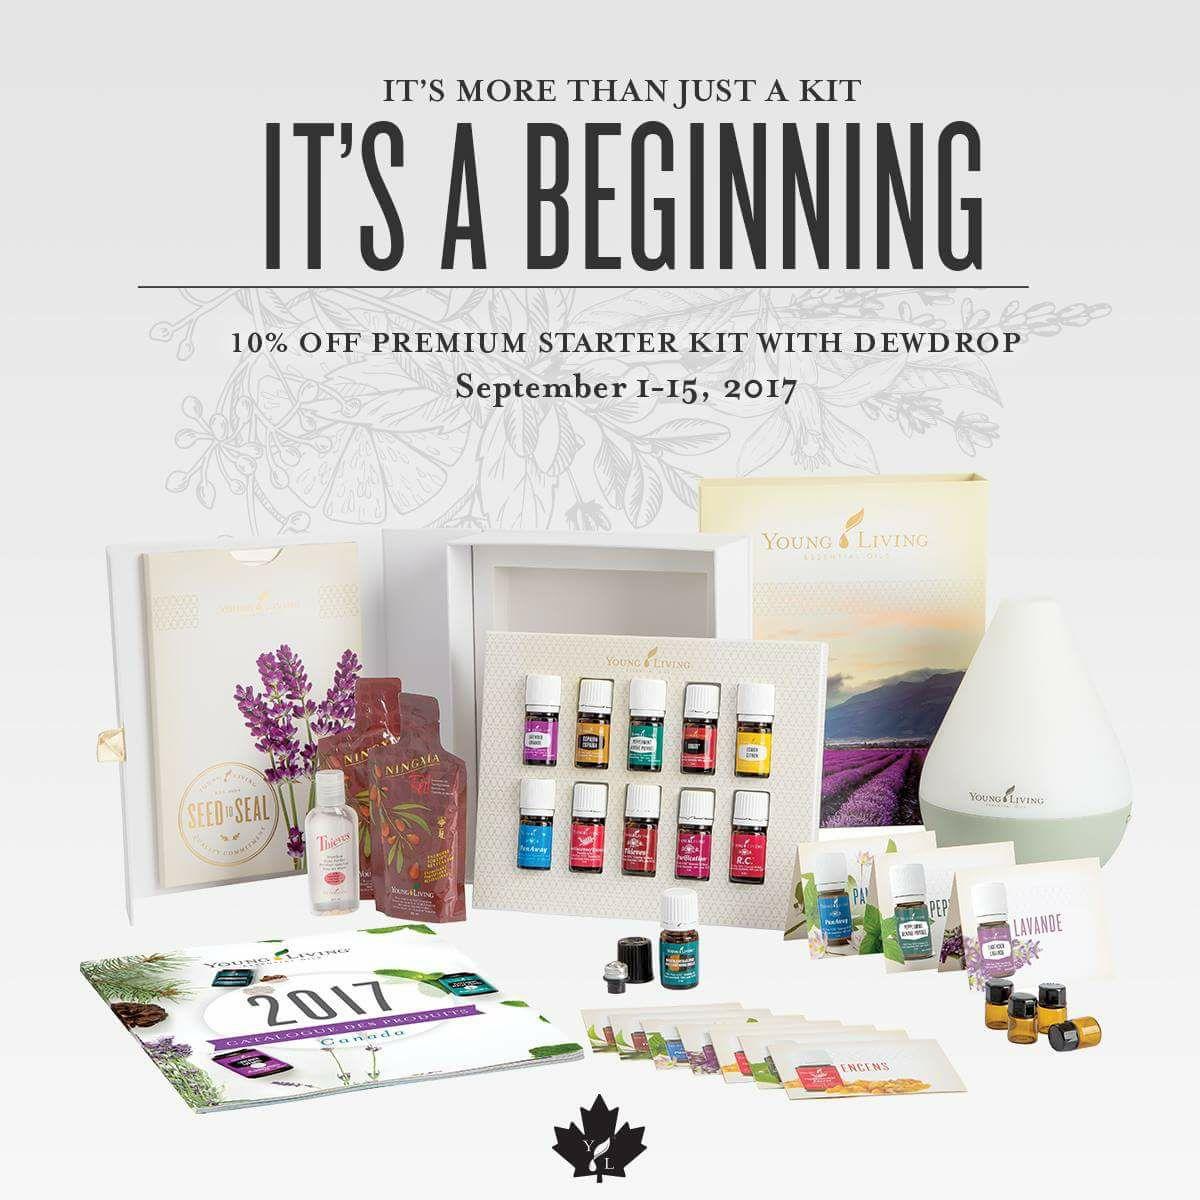 Get Your Essential Oils Premium Starter Kit At 10 Off